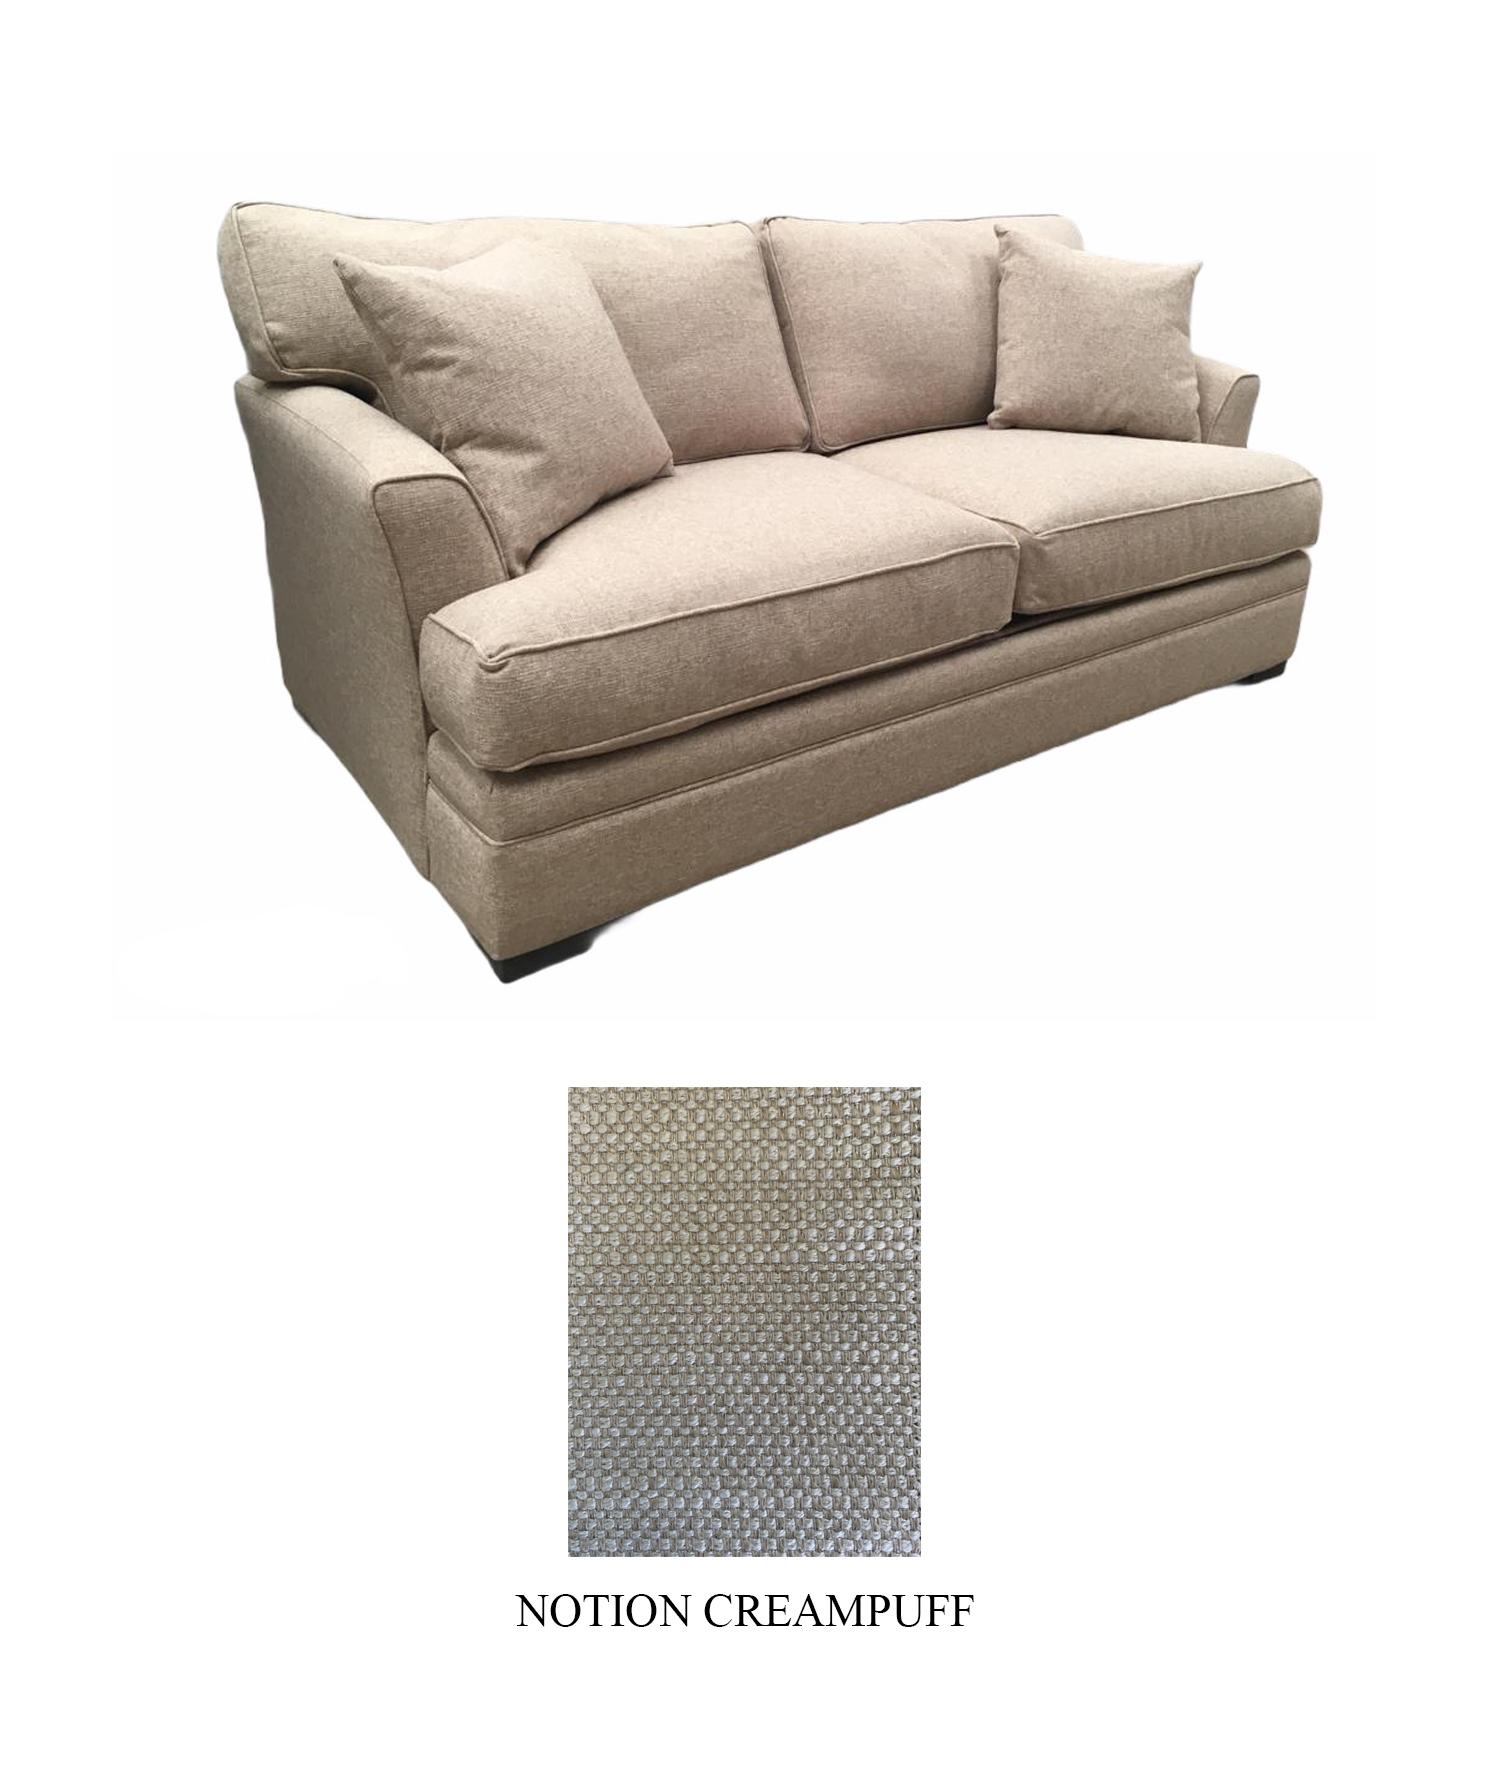 324 Full Sleeper Sofa